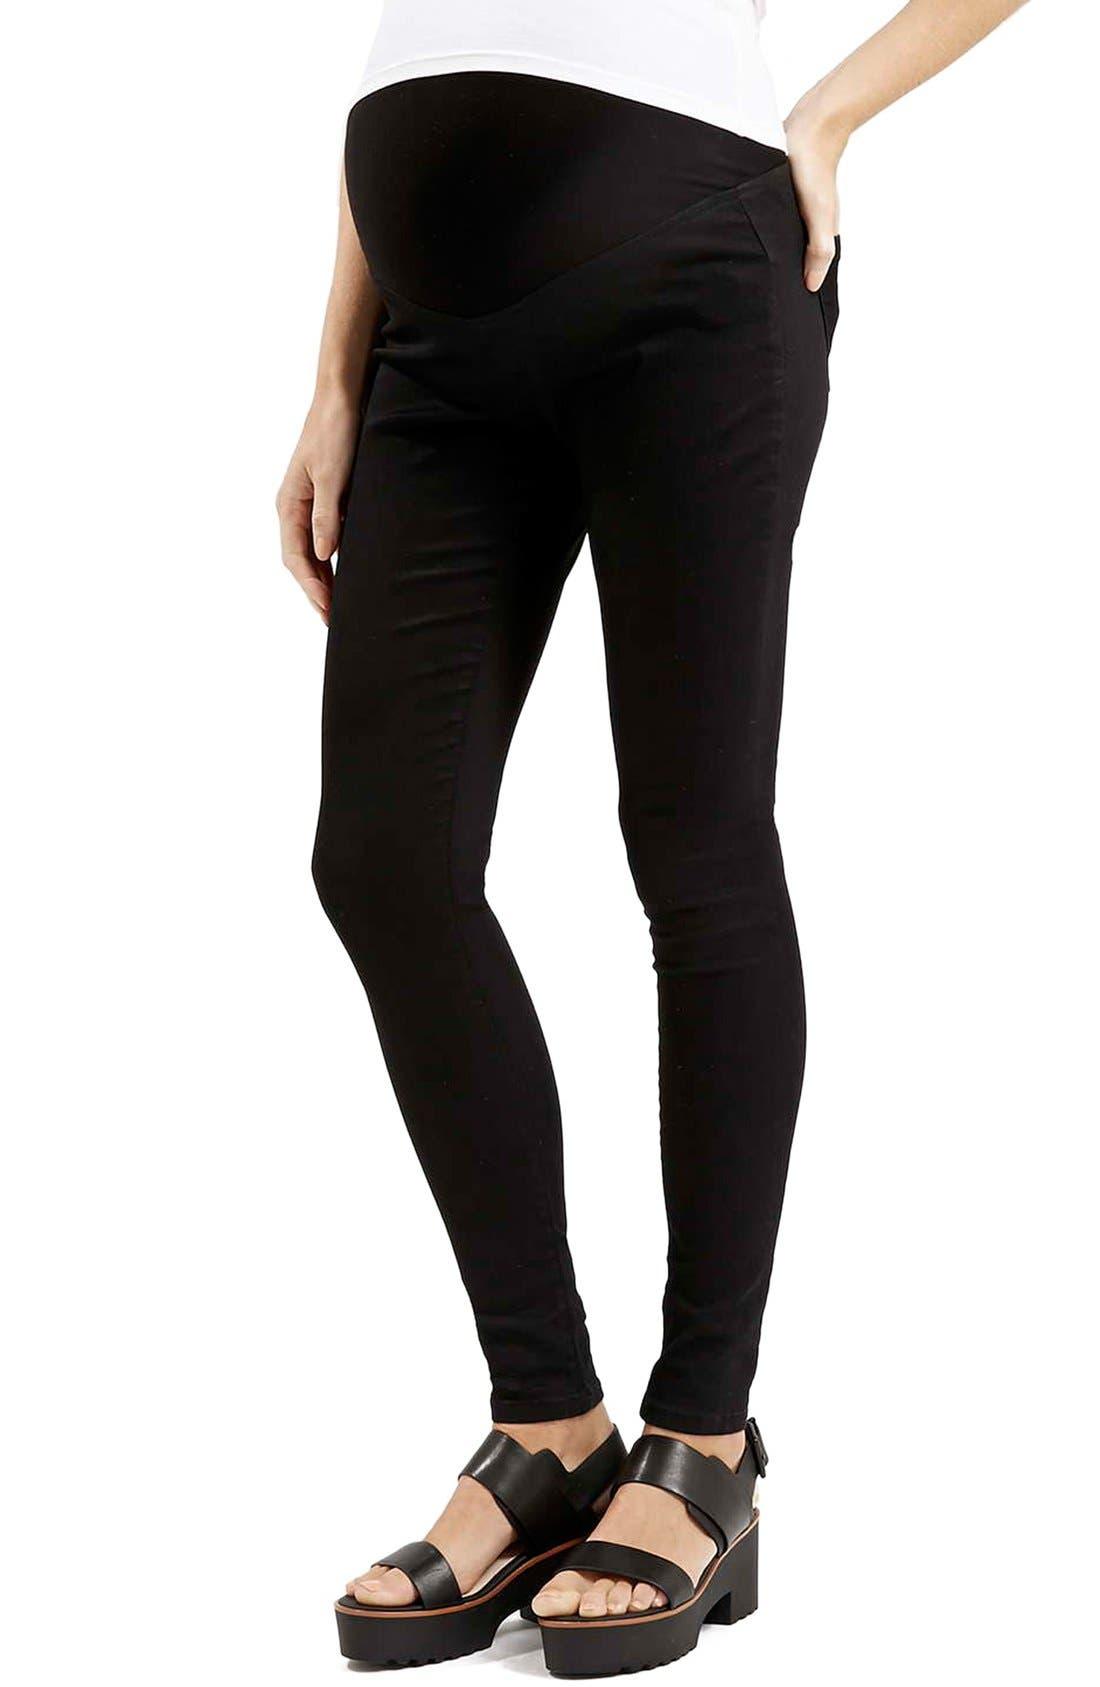 Topshop Moto 'Joni' Skinny Maternity Jeans